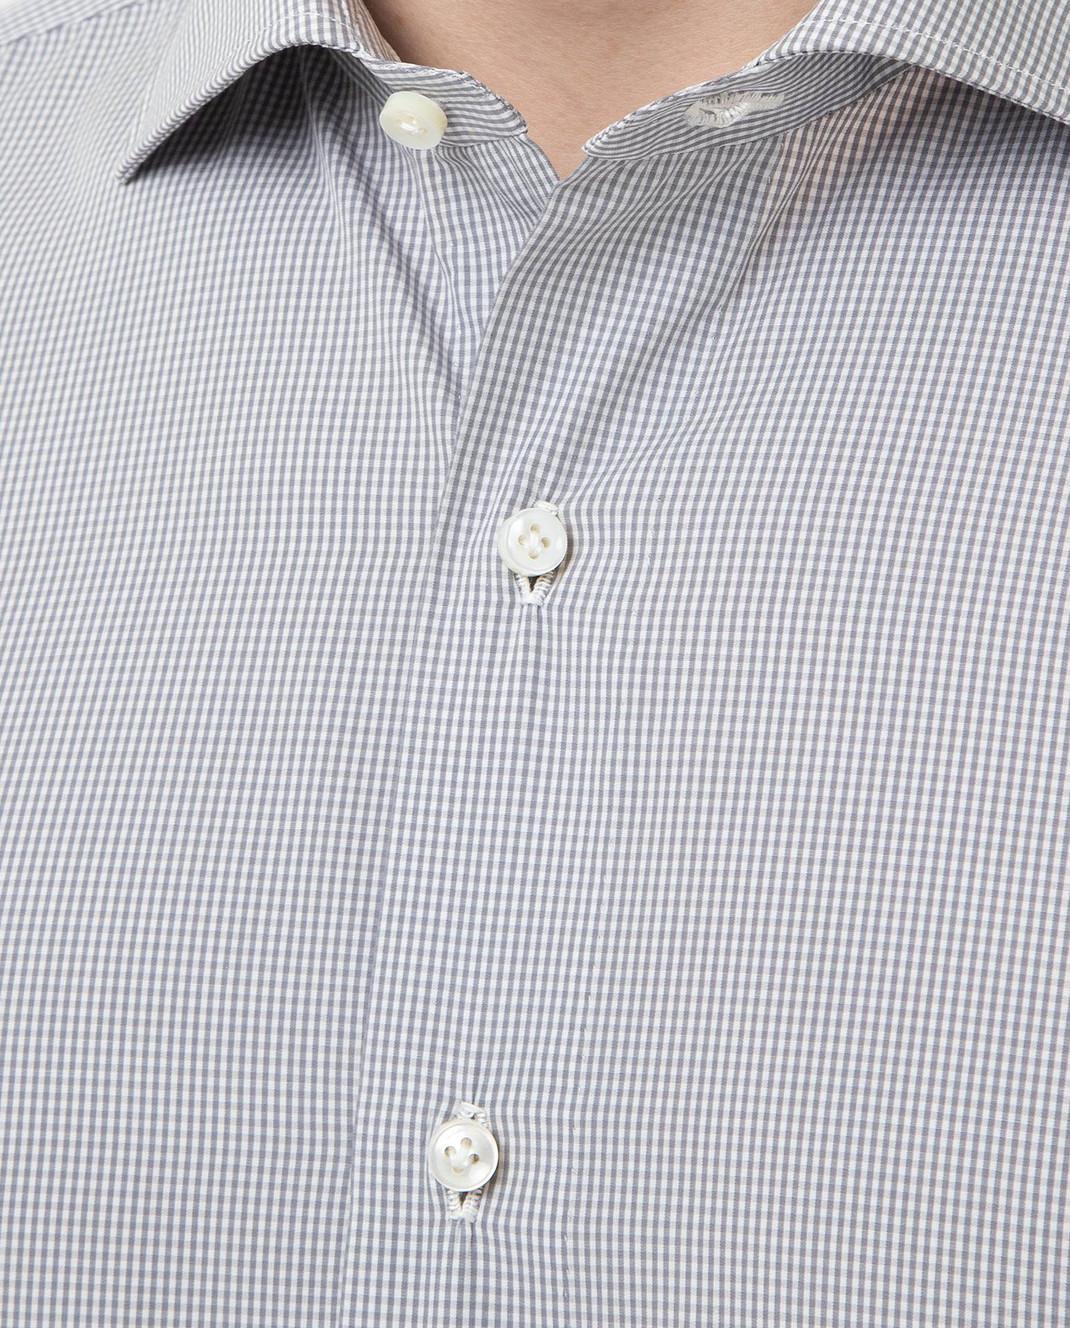 Luciano Lombardi Серая рубашка 990631 изображение 5